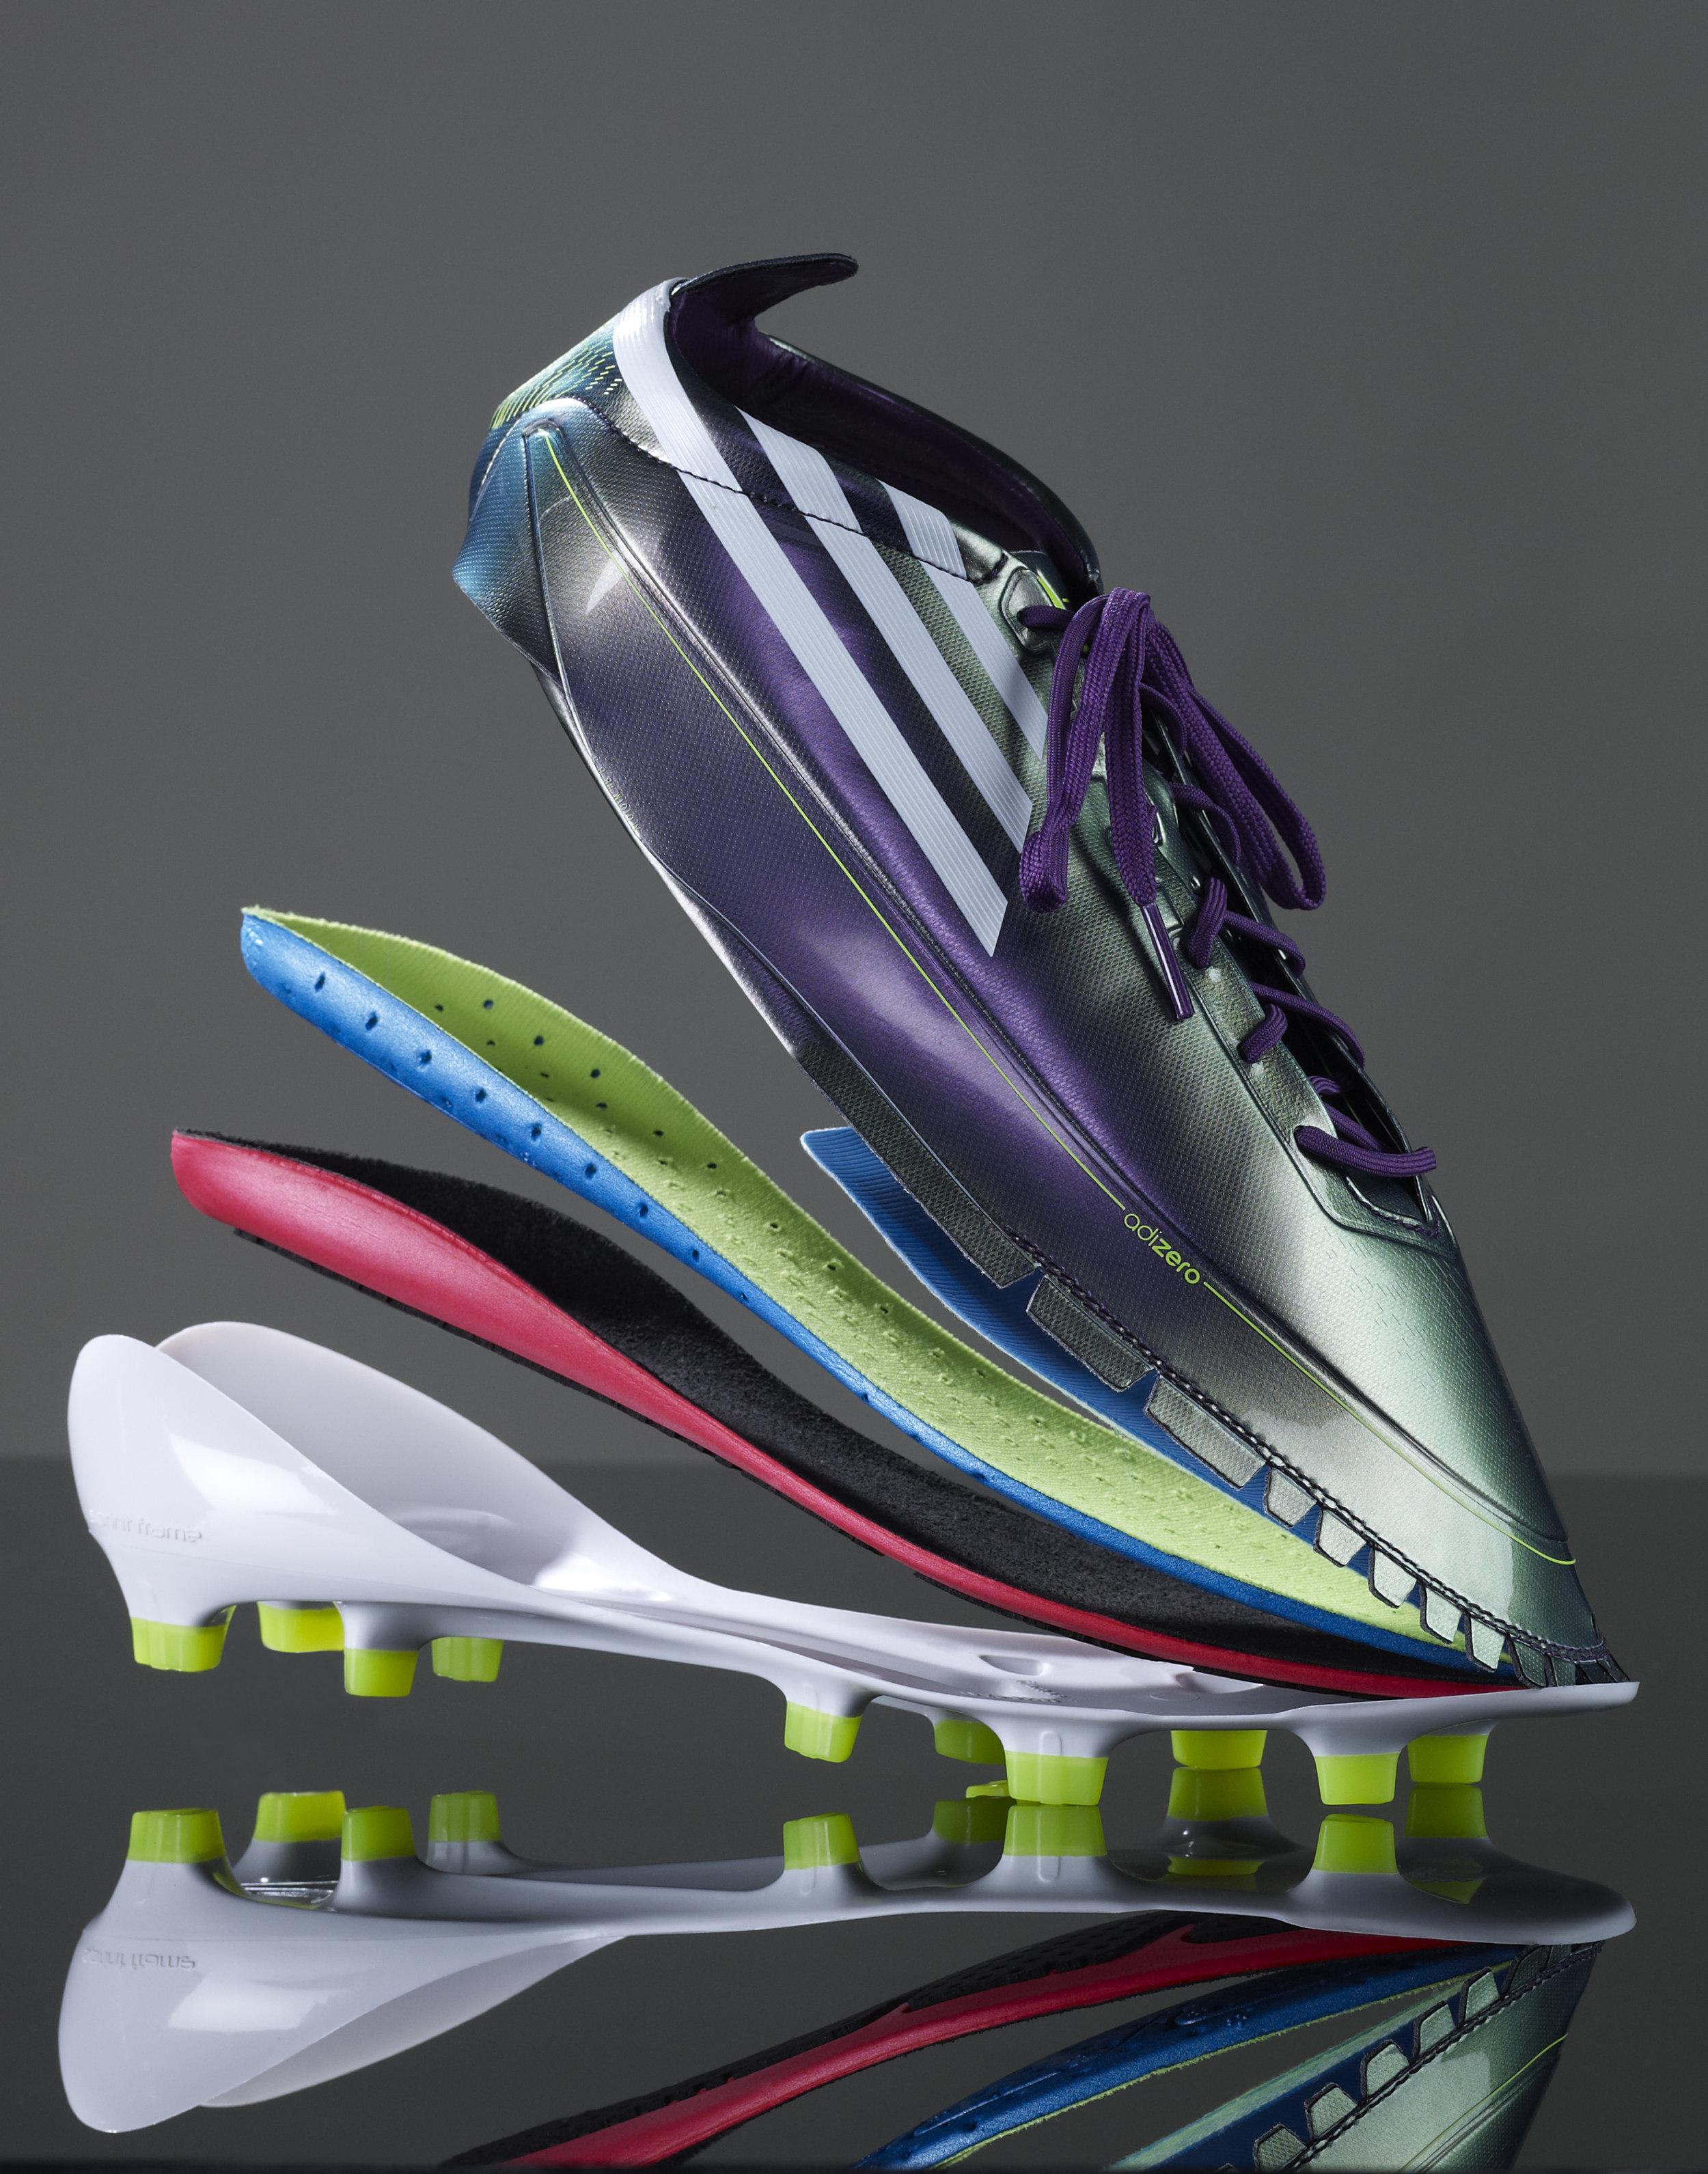 Adidas_Cleat.jpg